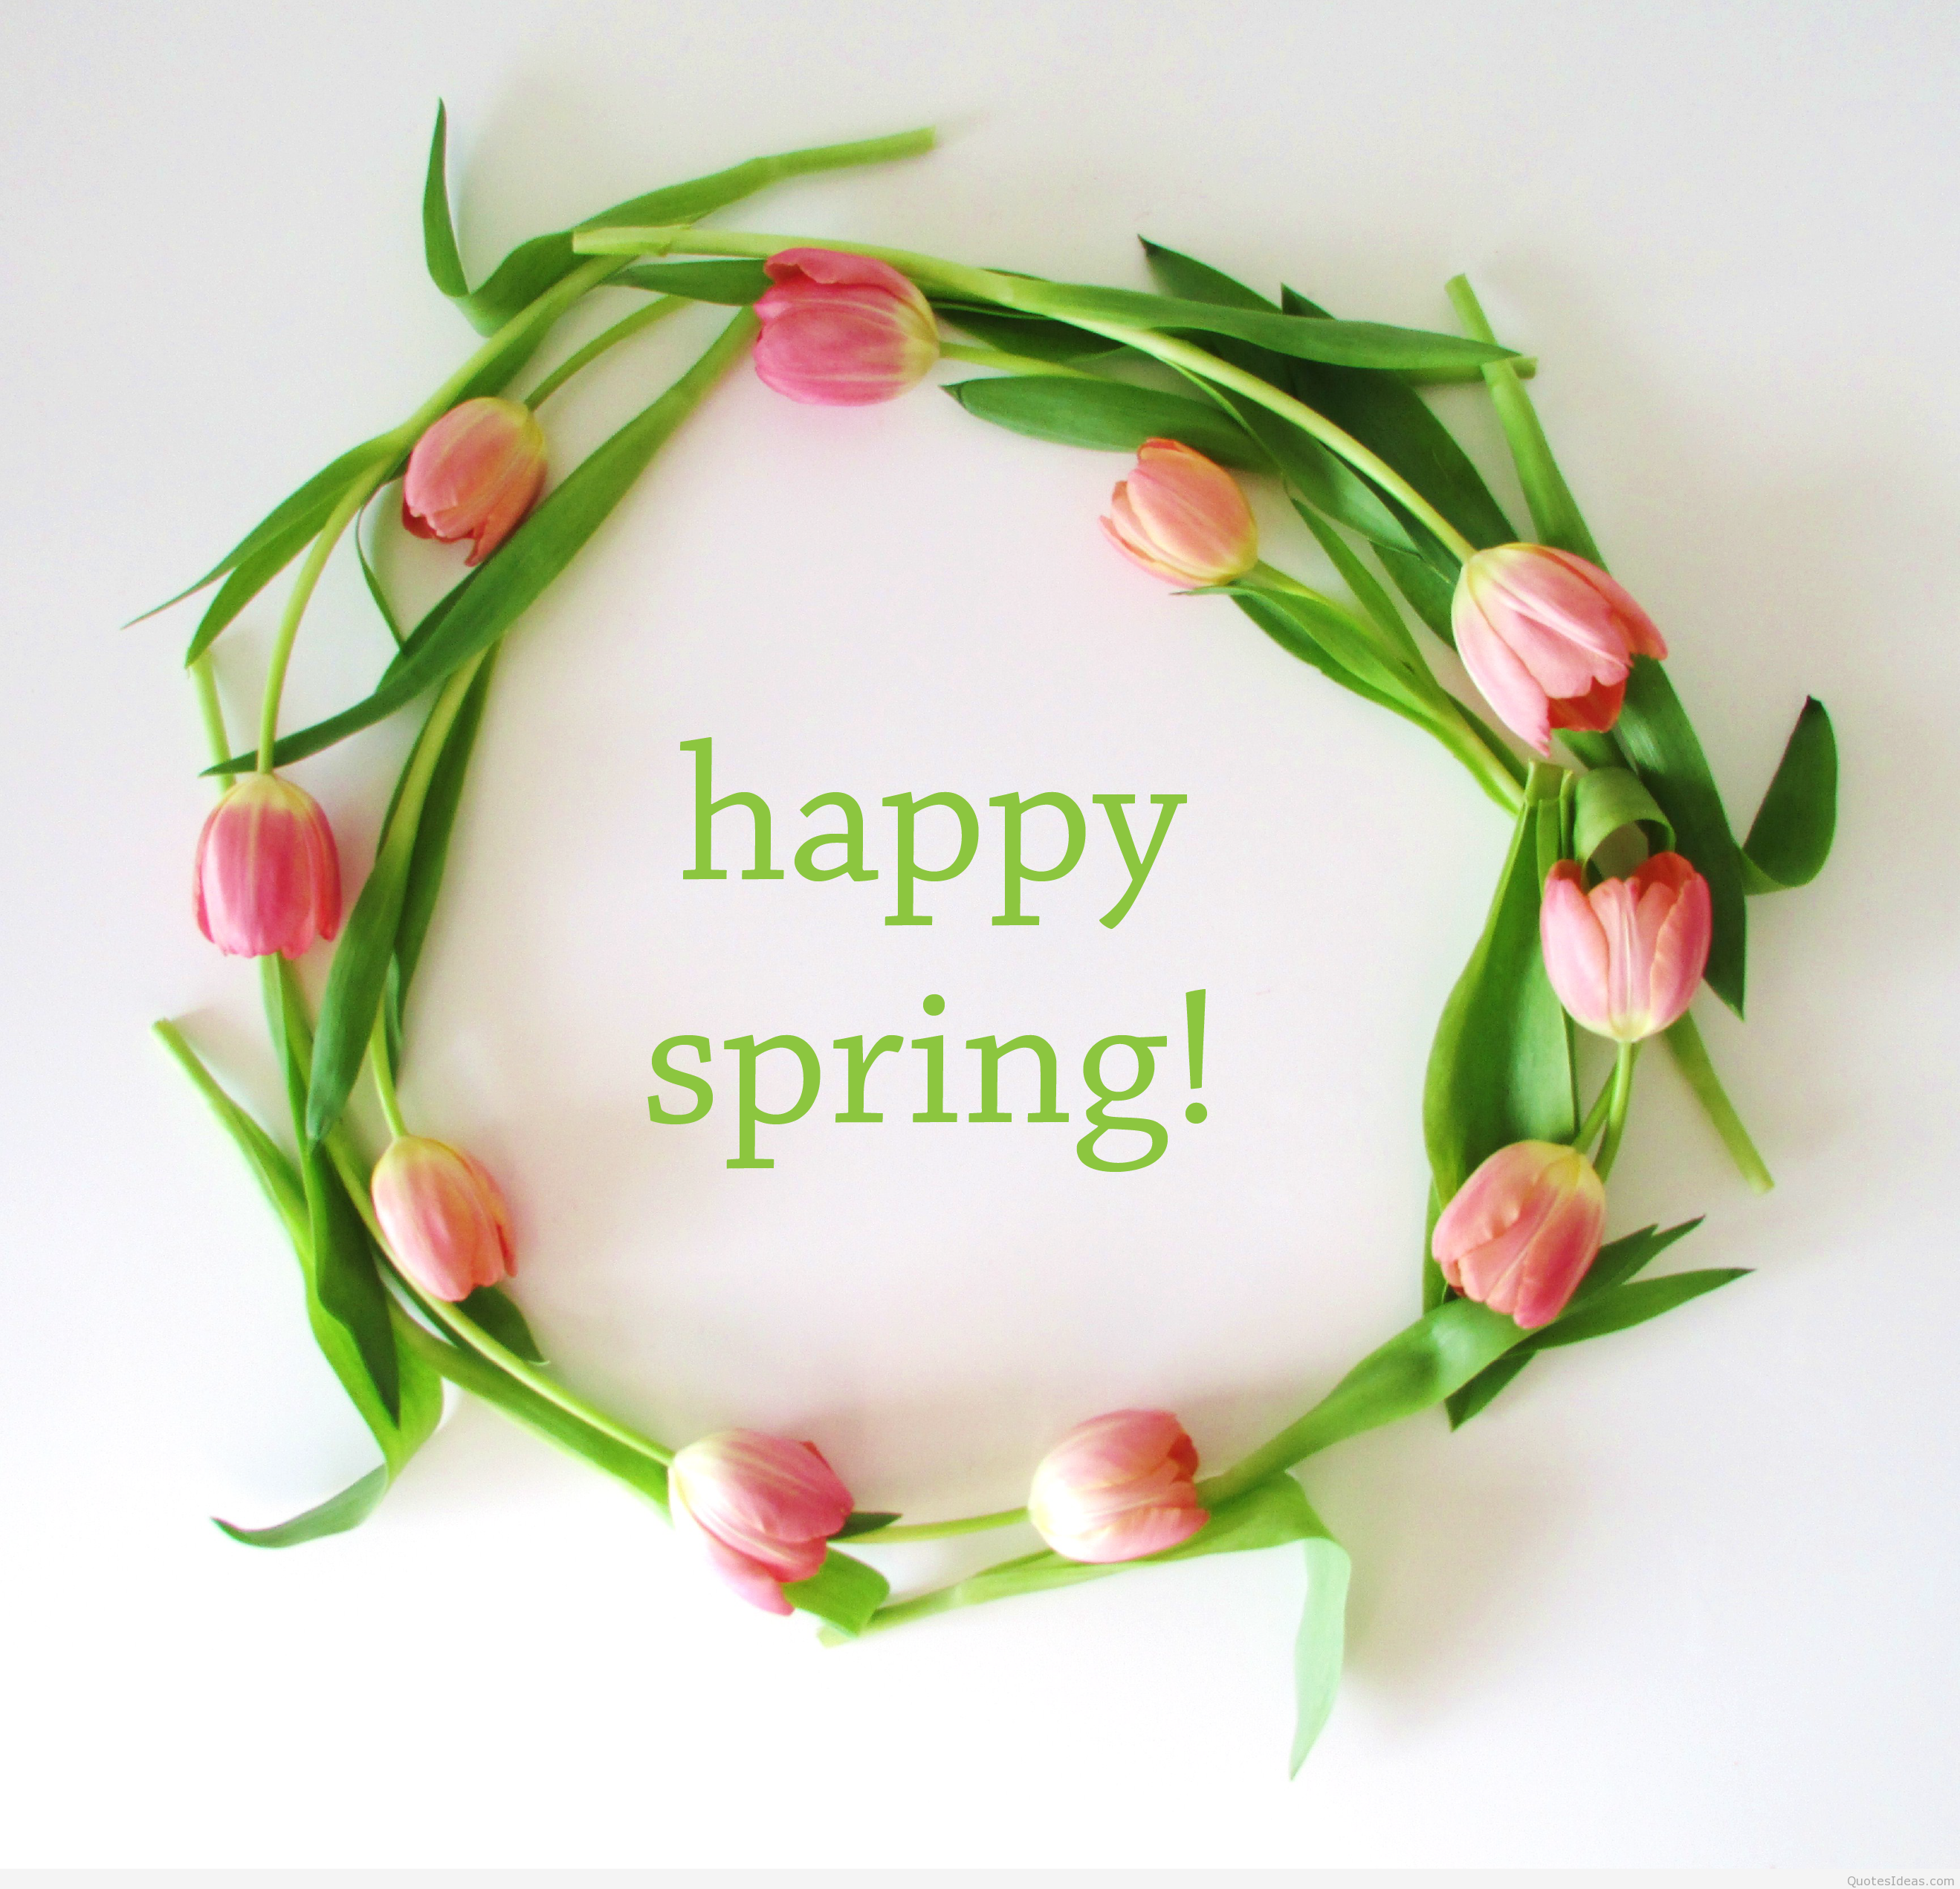 happy spring pics hd 2637x2542